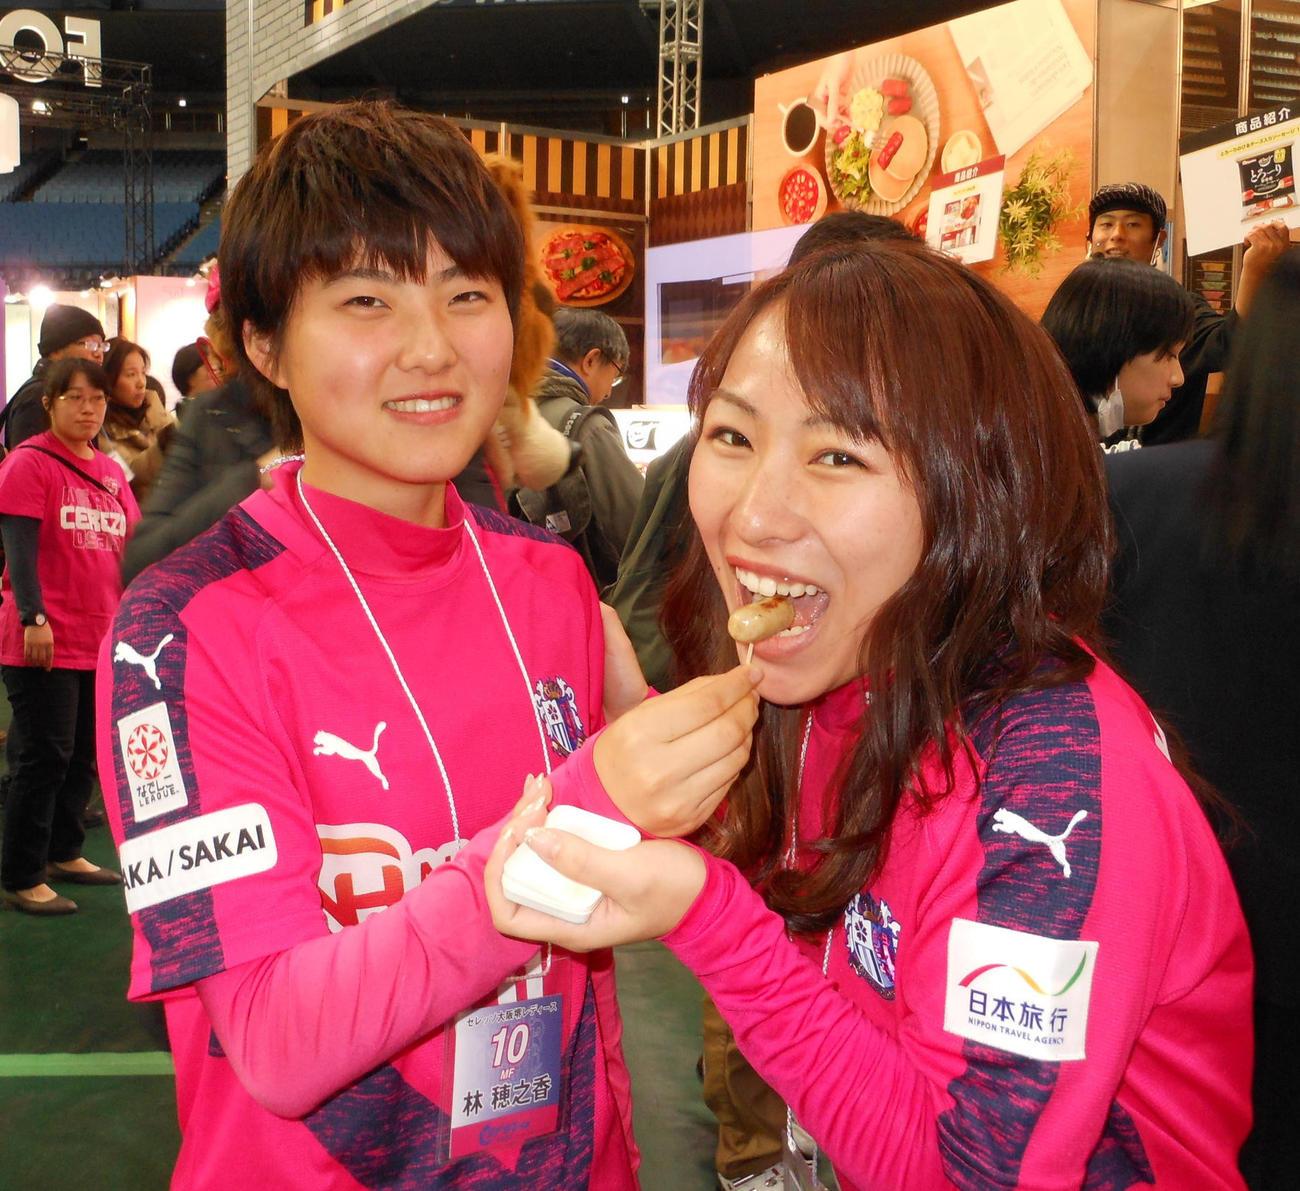 C大阪堺のMF林穂之香(左)は試食会で同僚のMF古沢留衣にウインナーを食べさせる